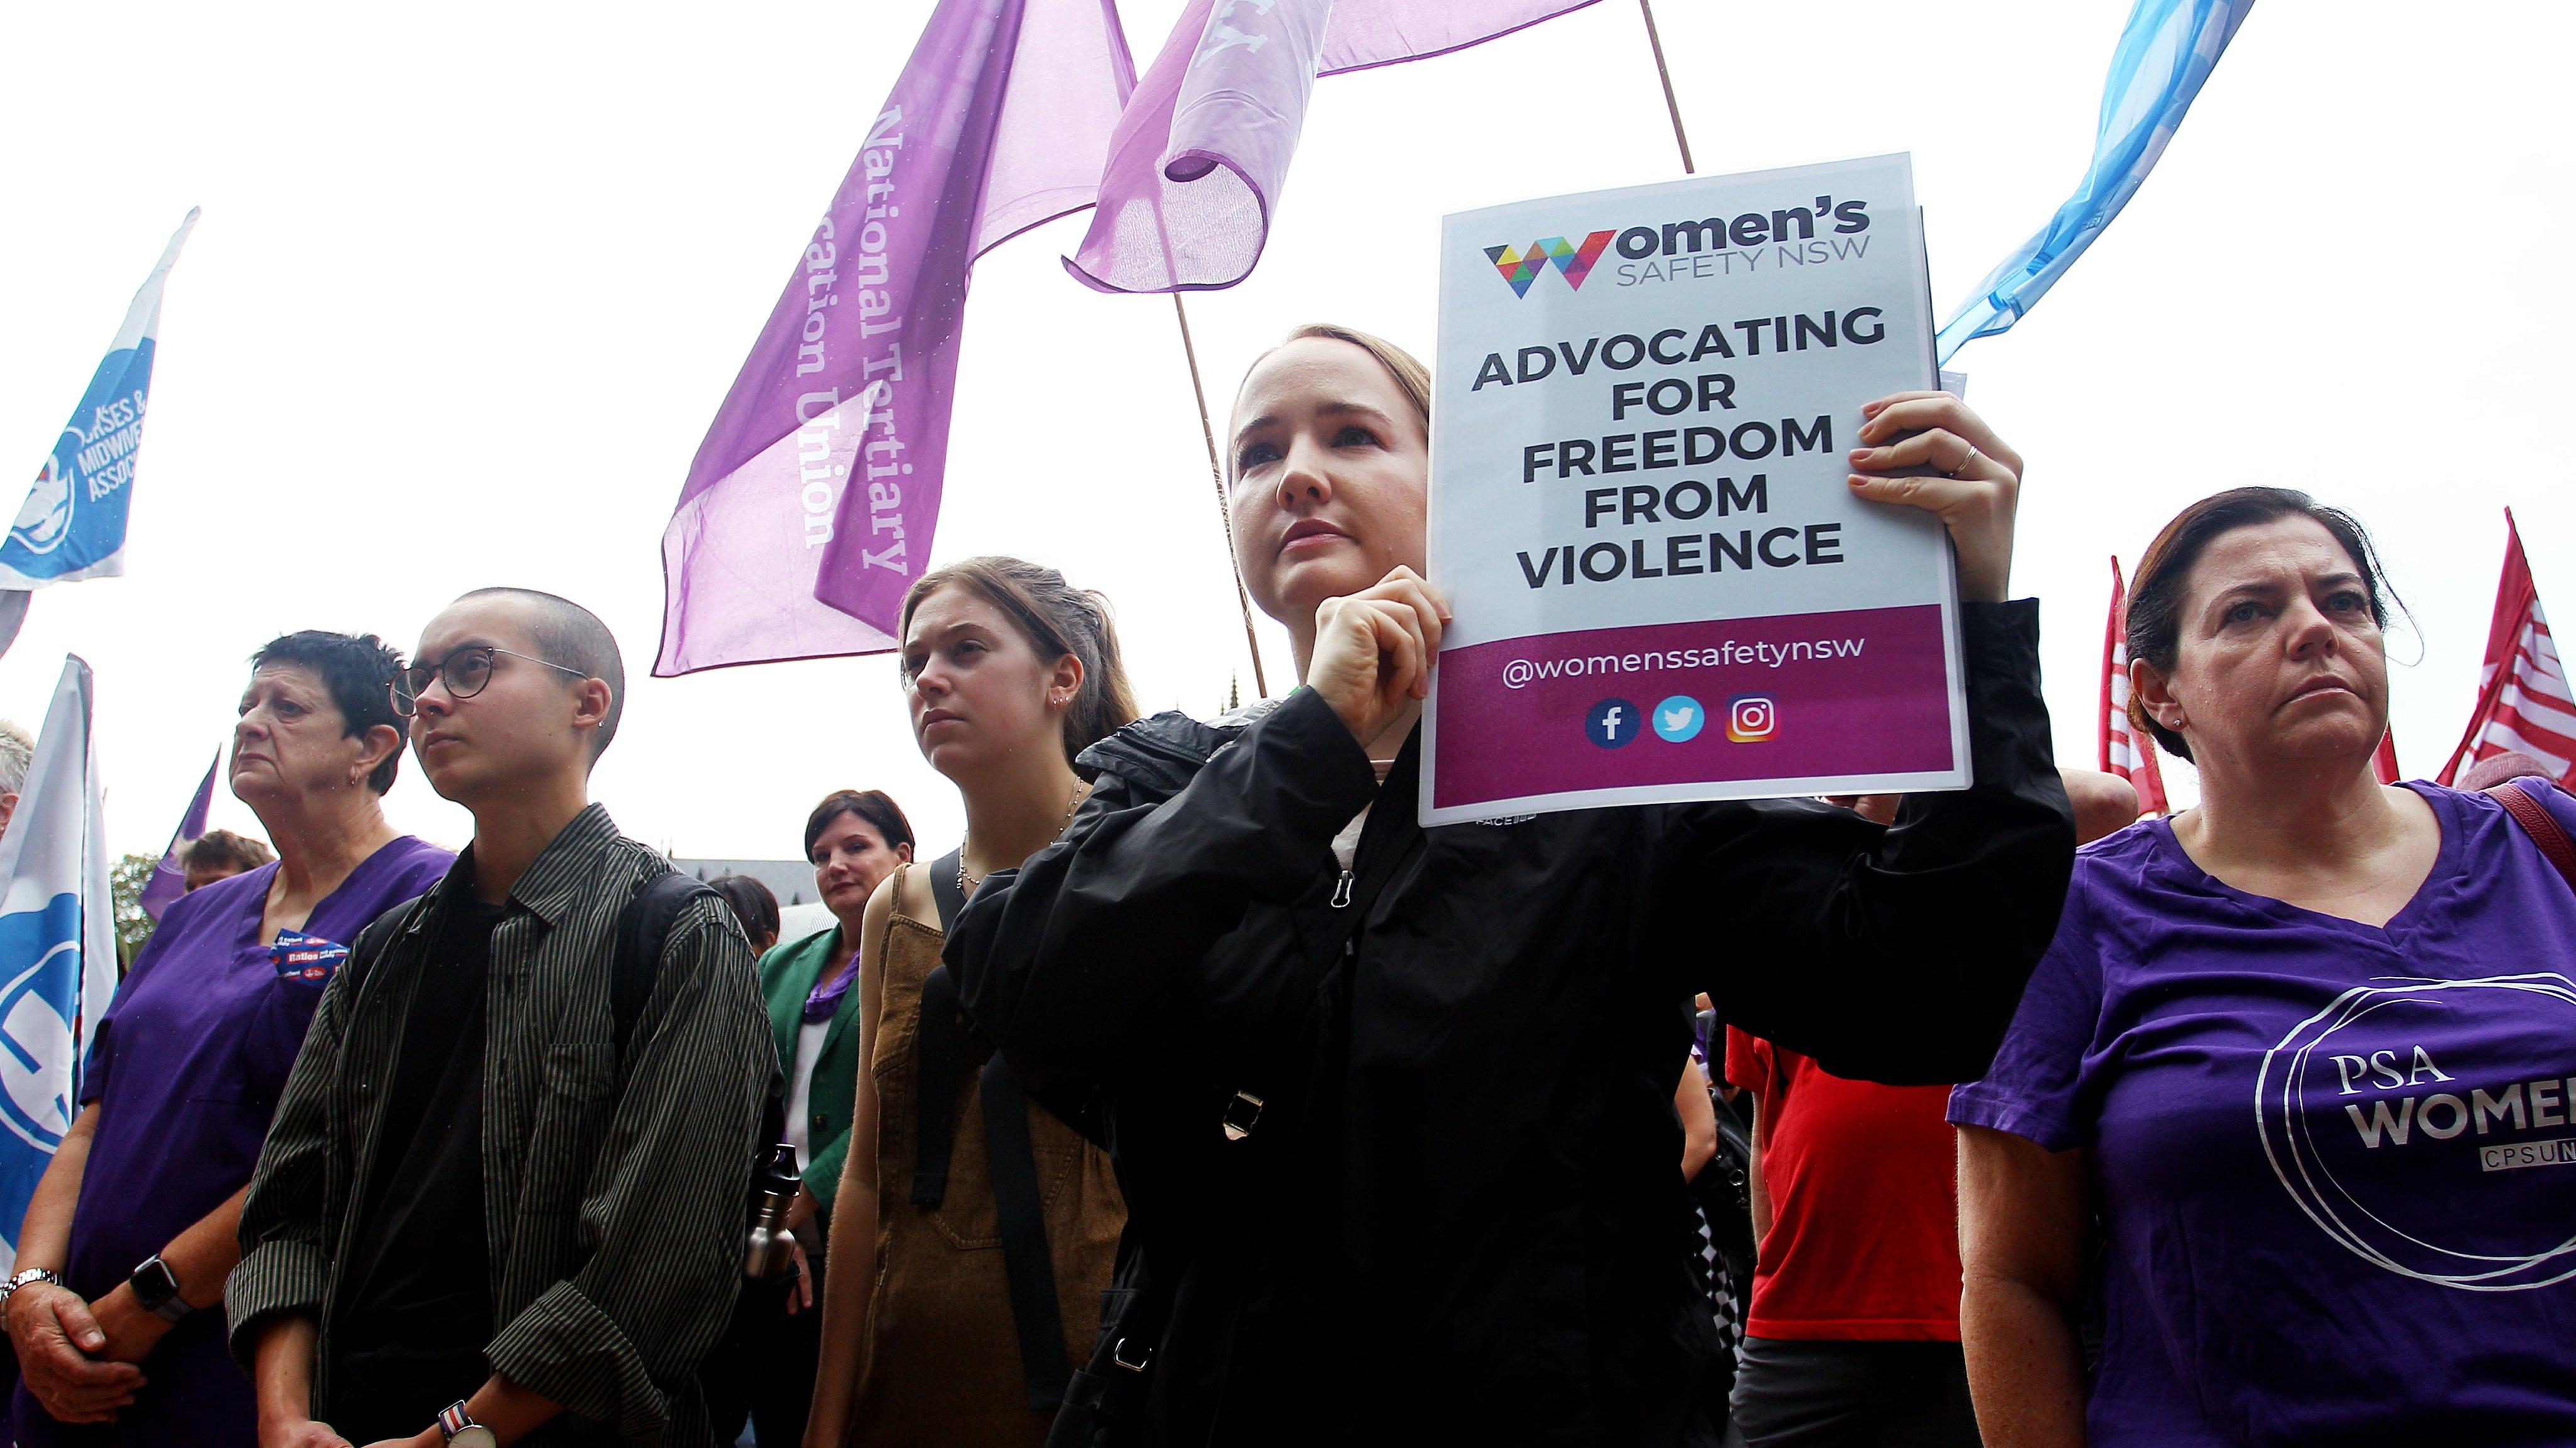 Sydneysiders Gather For International Women's Day March 2020